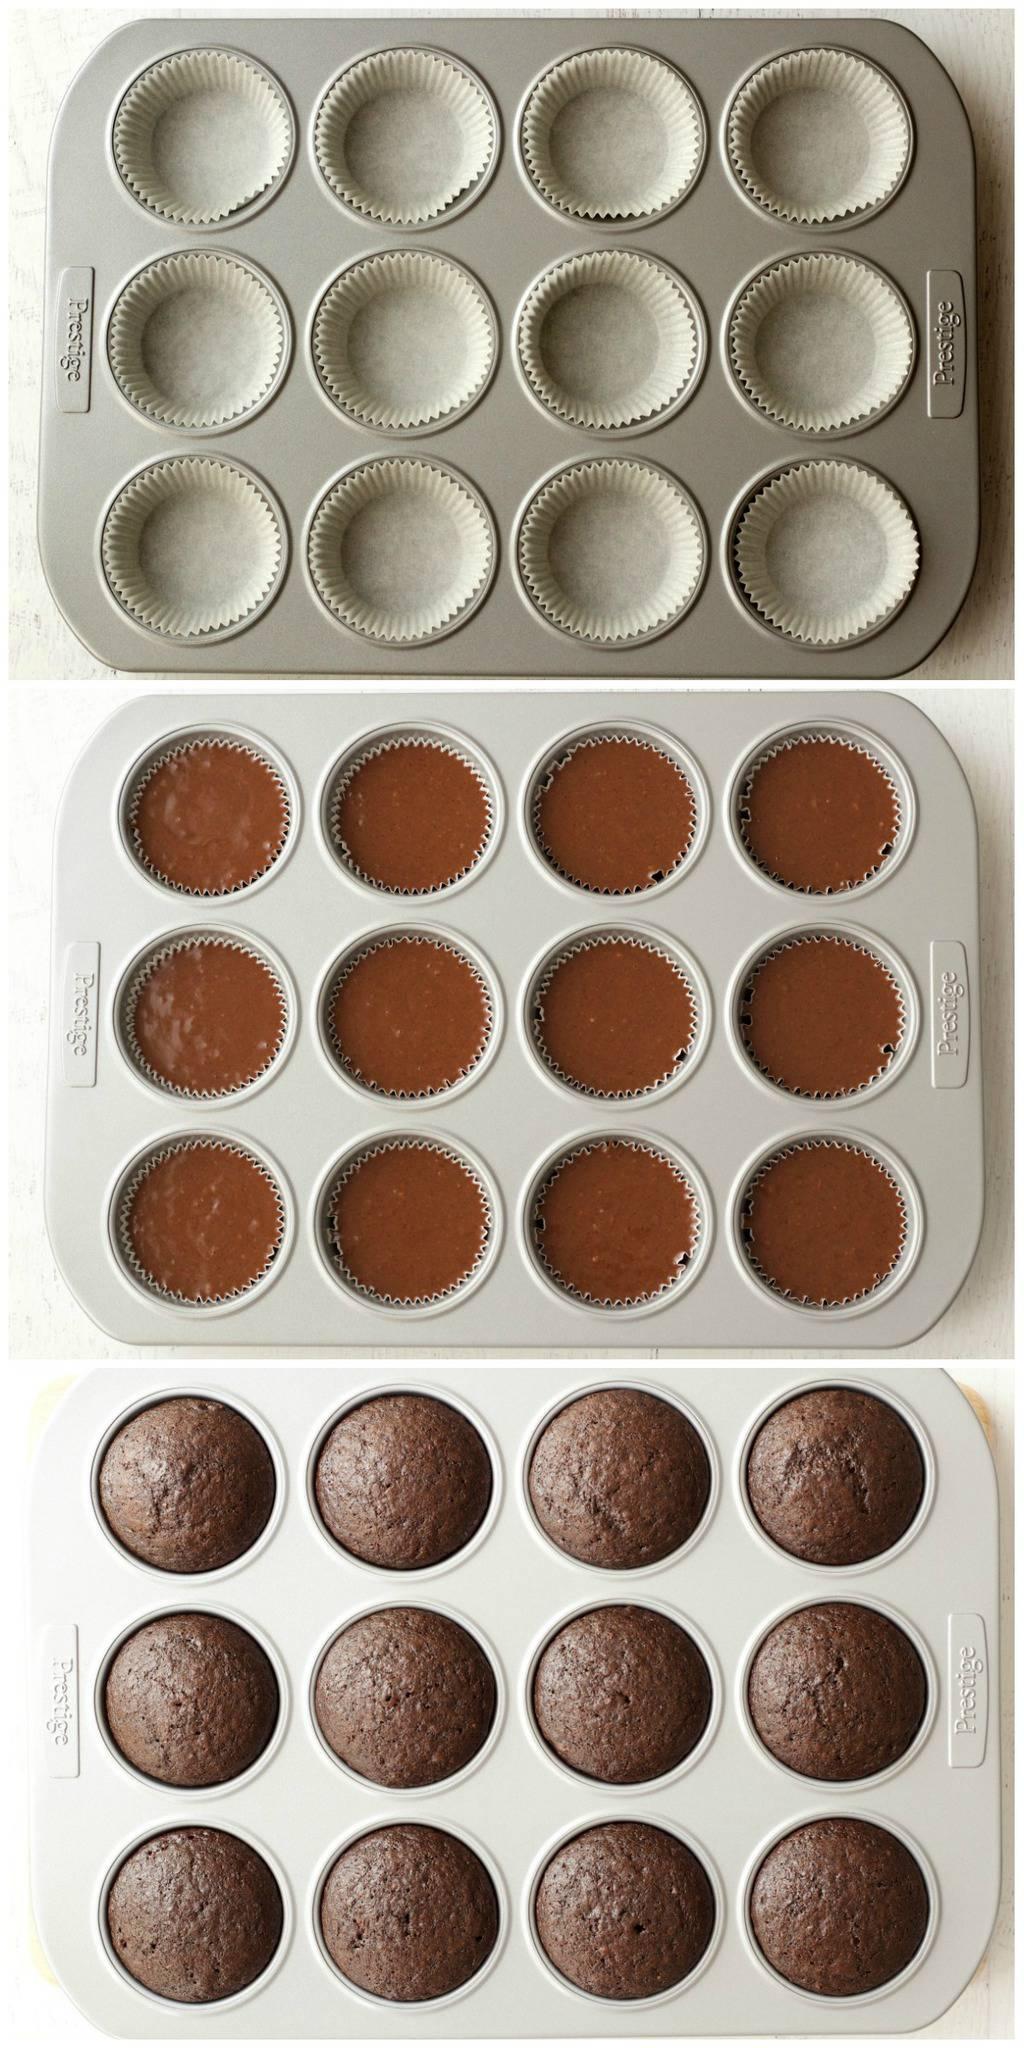 Making Vegan Chocolate Cupcakes with Mint Buttercream Frosting #vegan #lovingitvegan